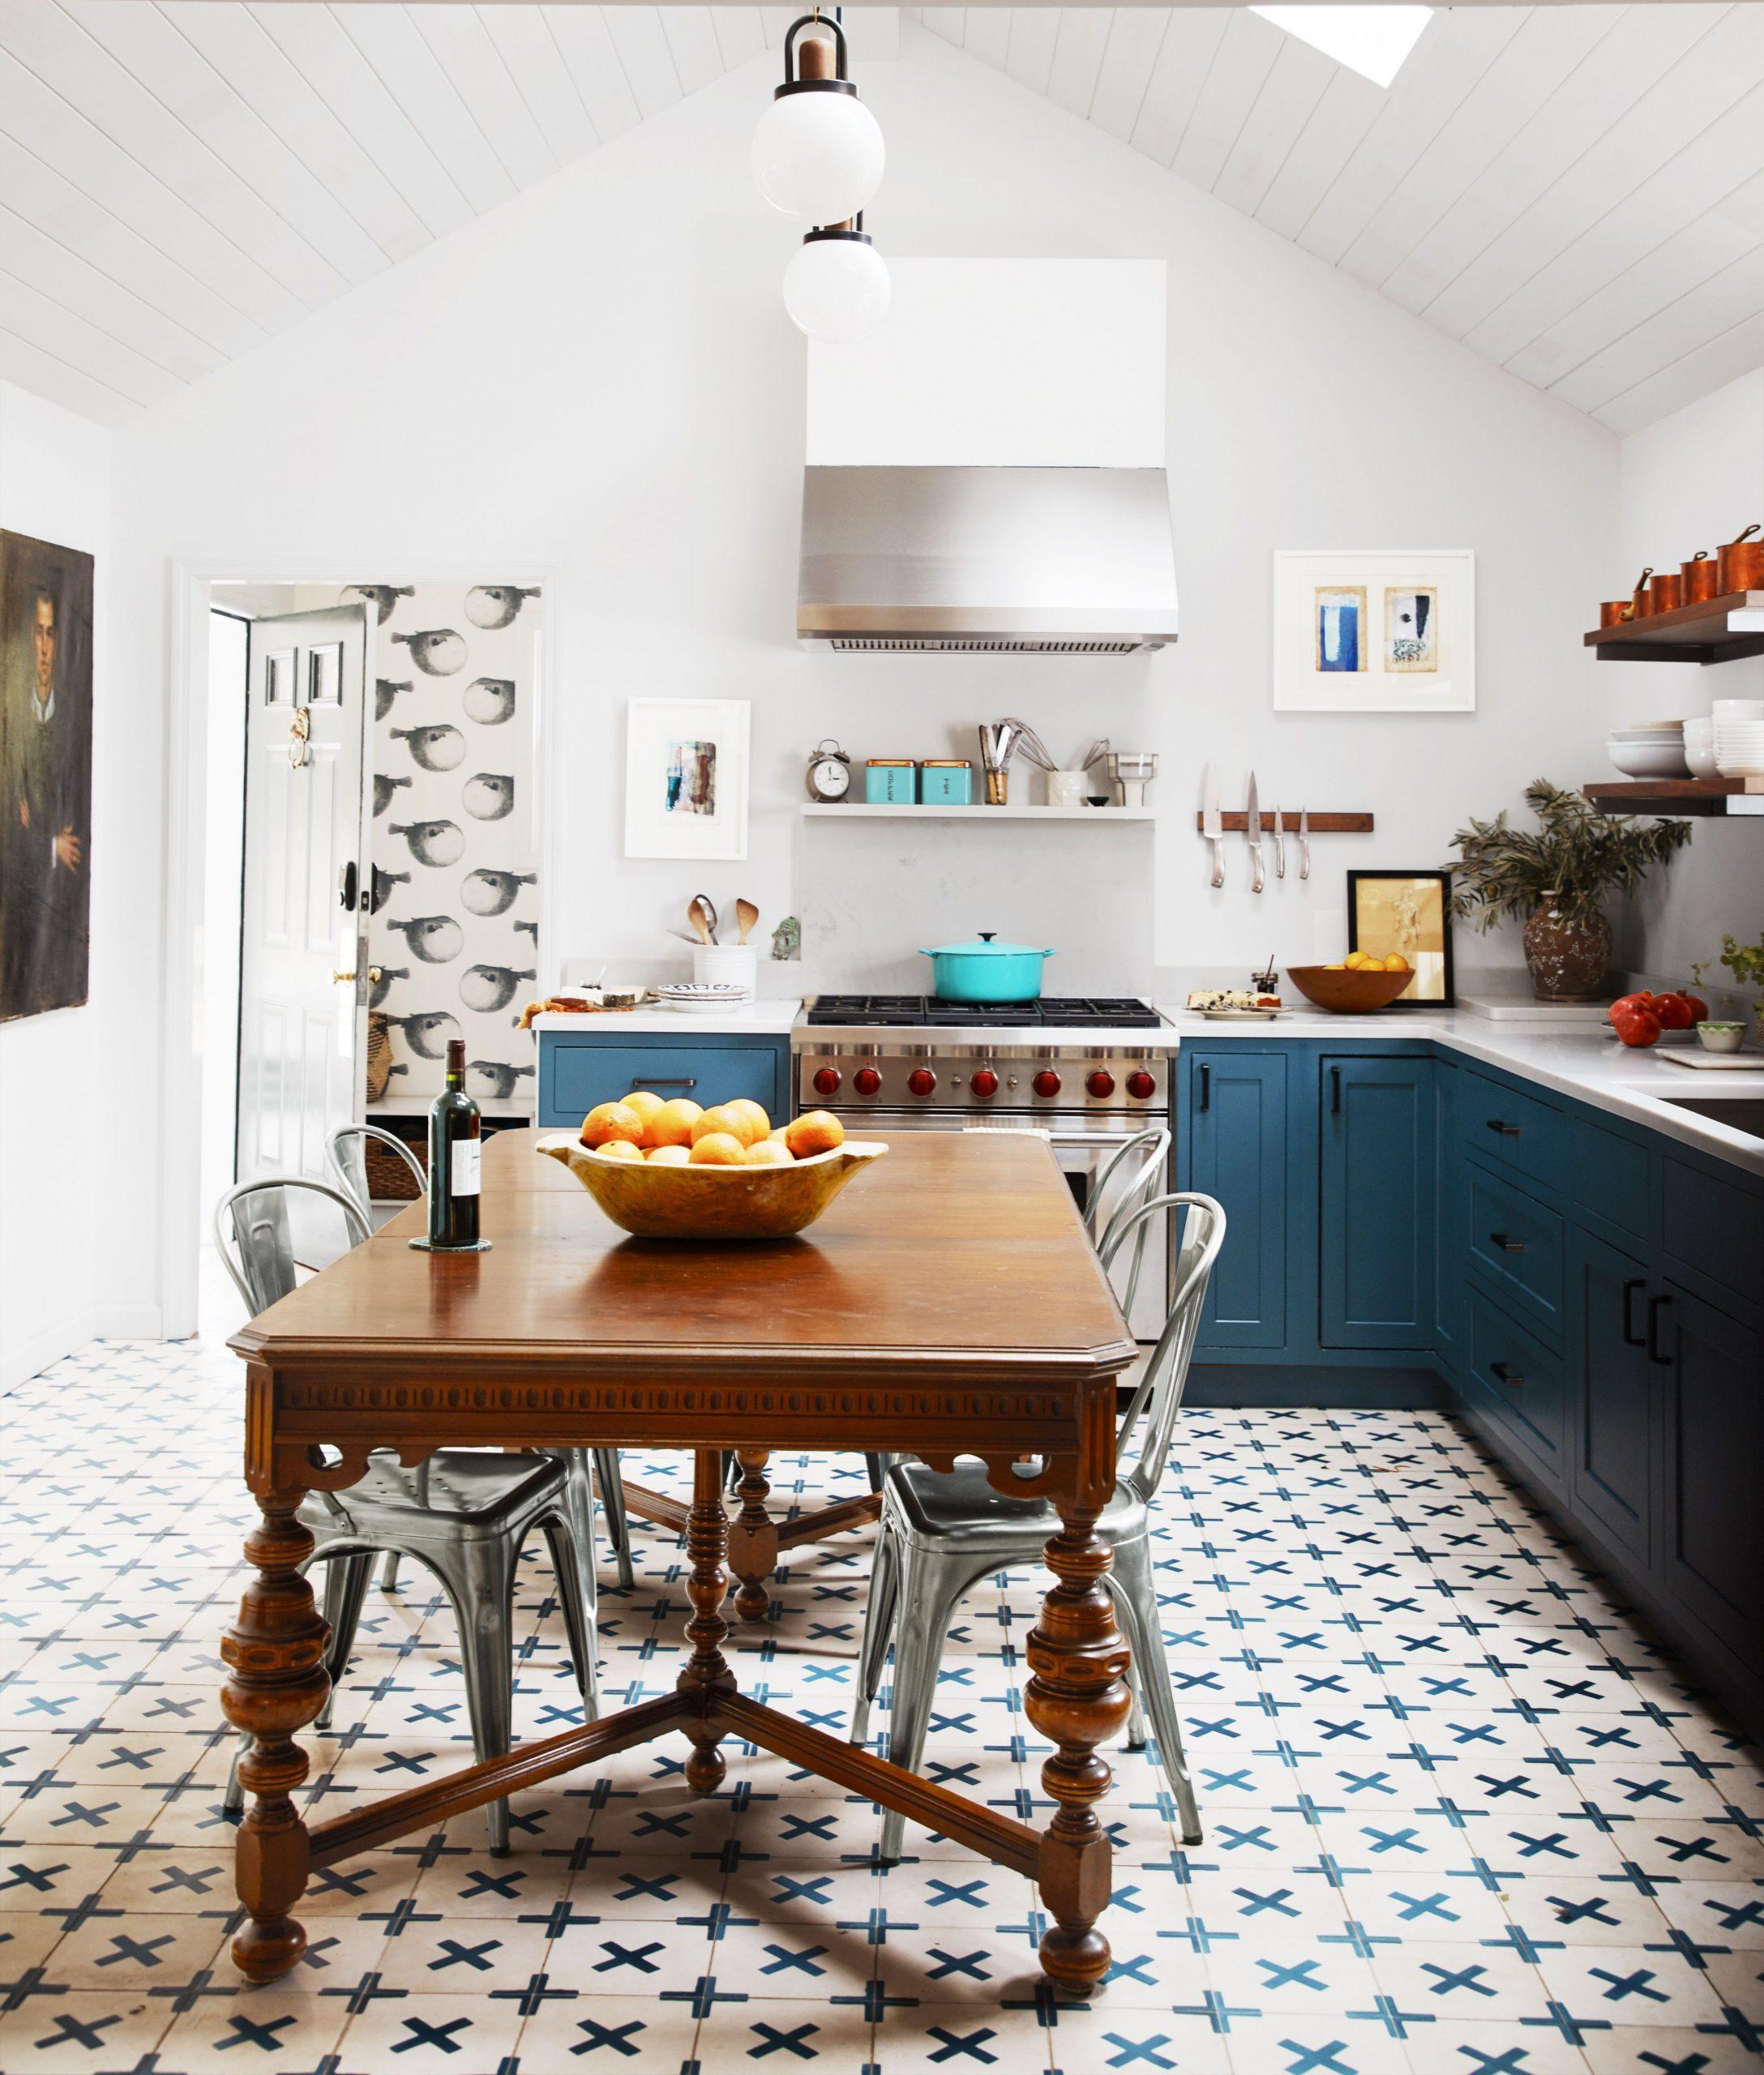 12 Best Kitchen Ideas - Decor and Decorating Ideas for Kitchen Design - Kitchen Dining Room Ideas Uk